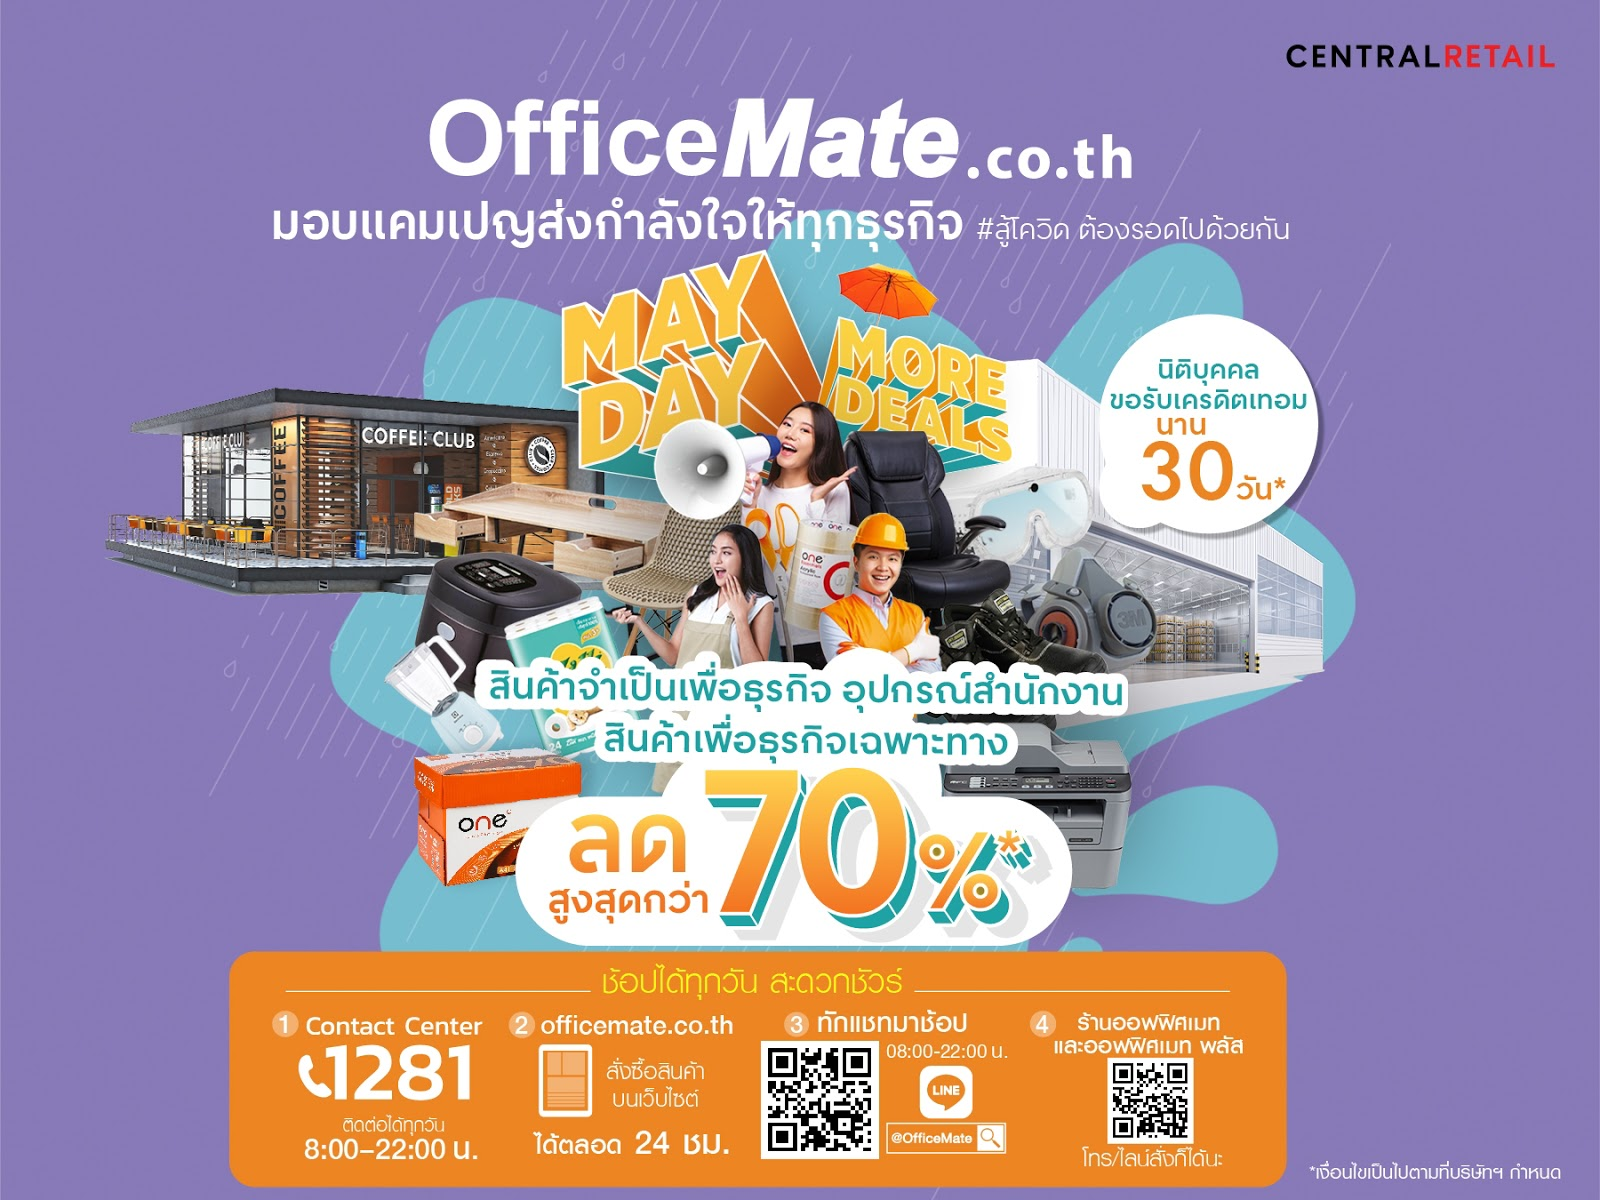 OfficeMate ช่วยทุกธุรกิจ #สู้โควิด ต้องรอดไปด้วยกัน  ลดราคาสินค้าจำเป็นกว่า 6,000 รายการ สูงสุดถึง 70% เน้นสินค้าเพื่อคนขายของออนไลน์ คนทำร้านอาหารและคาเฟ่ และผู้ประกอบการโรงงานบริการจัดส่งฟรี ภายในวันทำการถัดไป